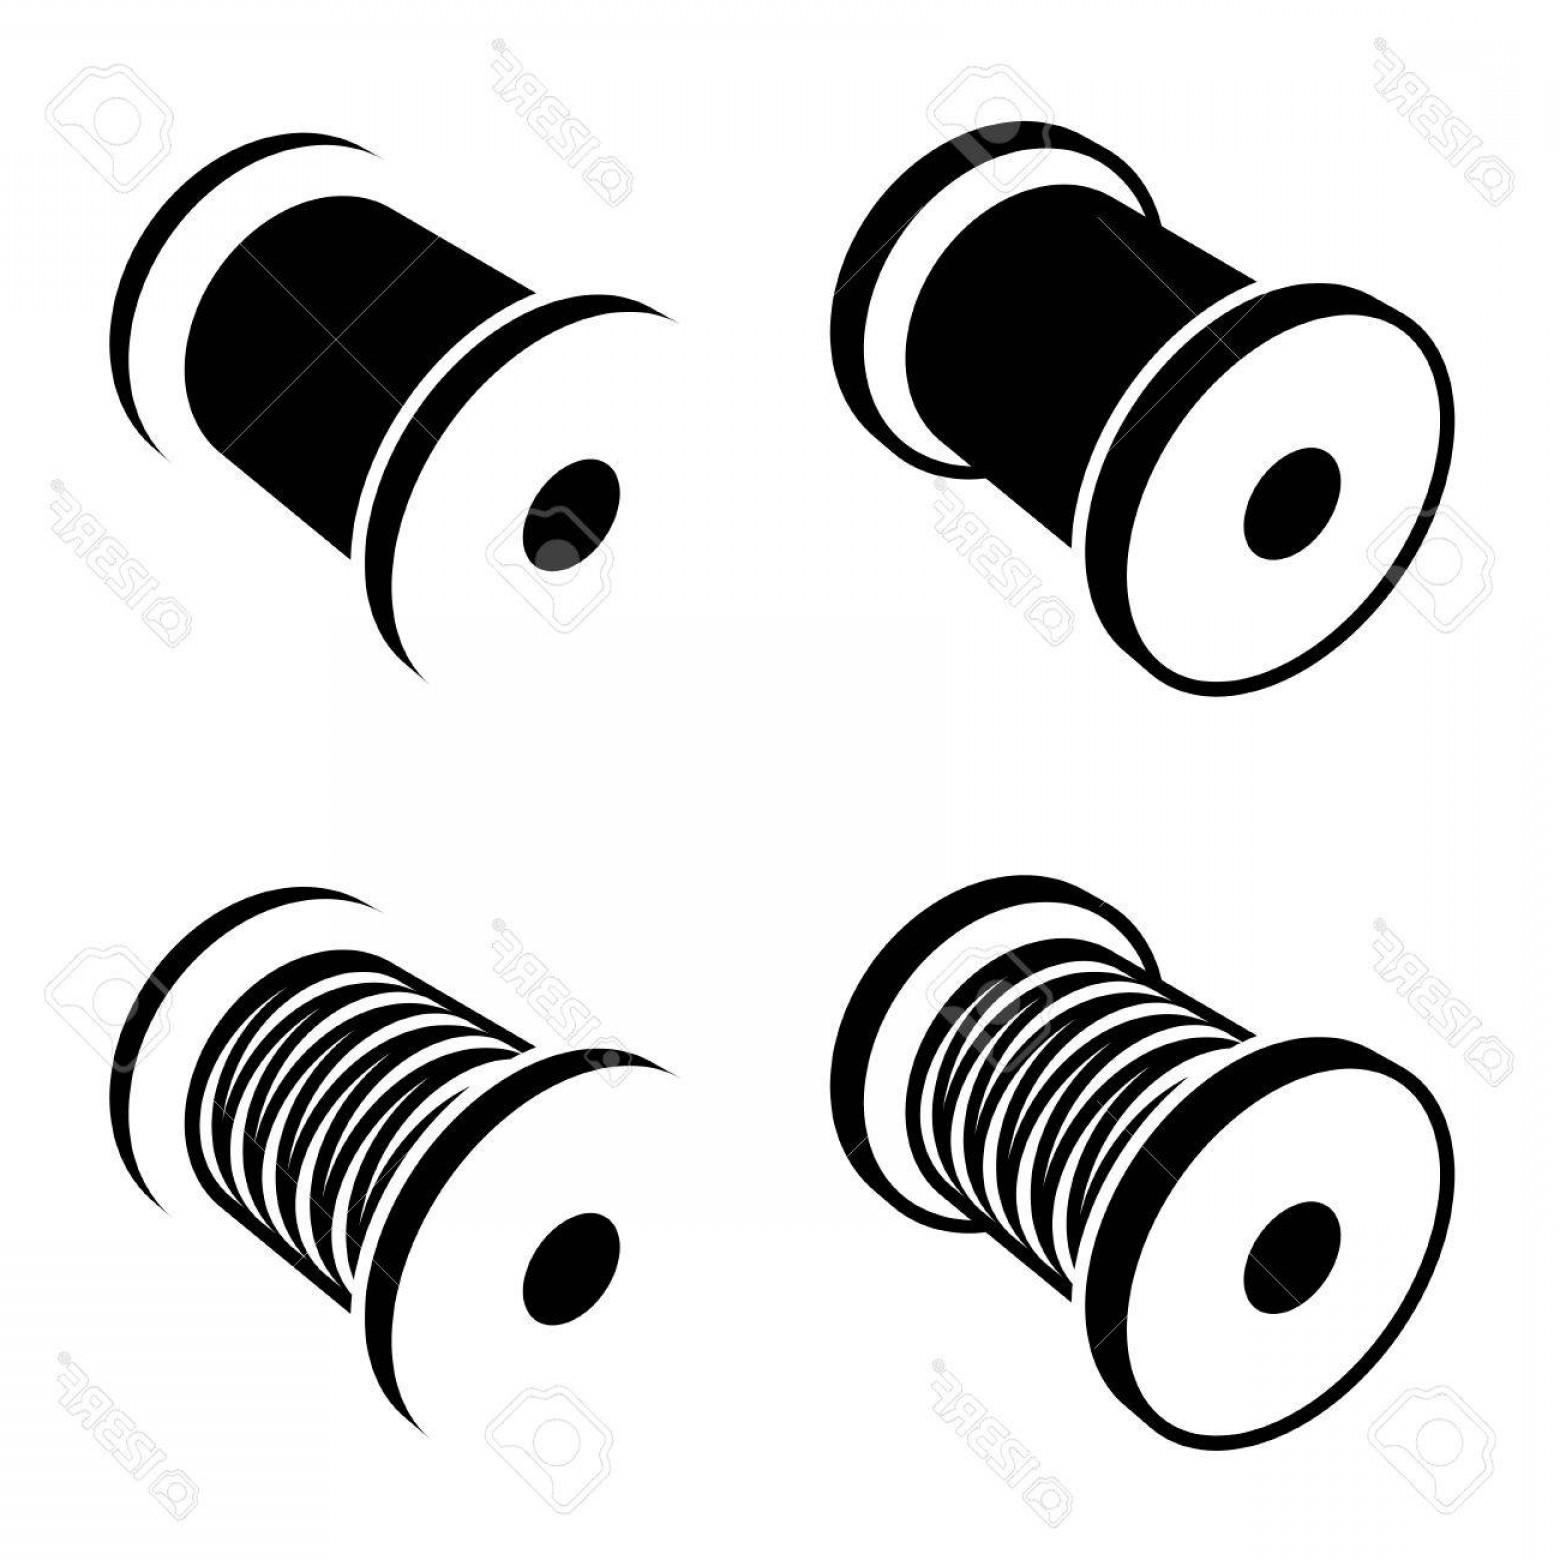 1560x1560 Photostock Vector Sewing Thread Spool Black Symbol Lazttweet